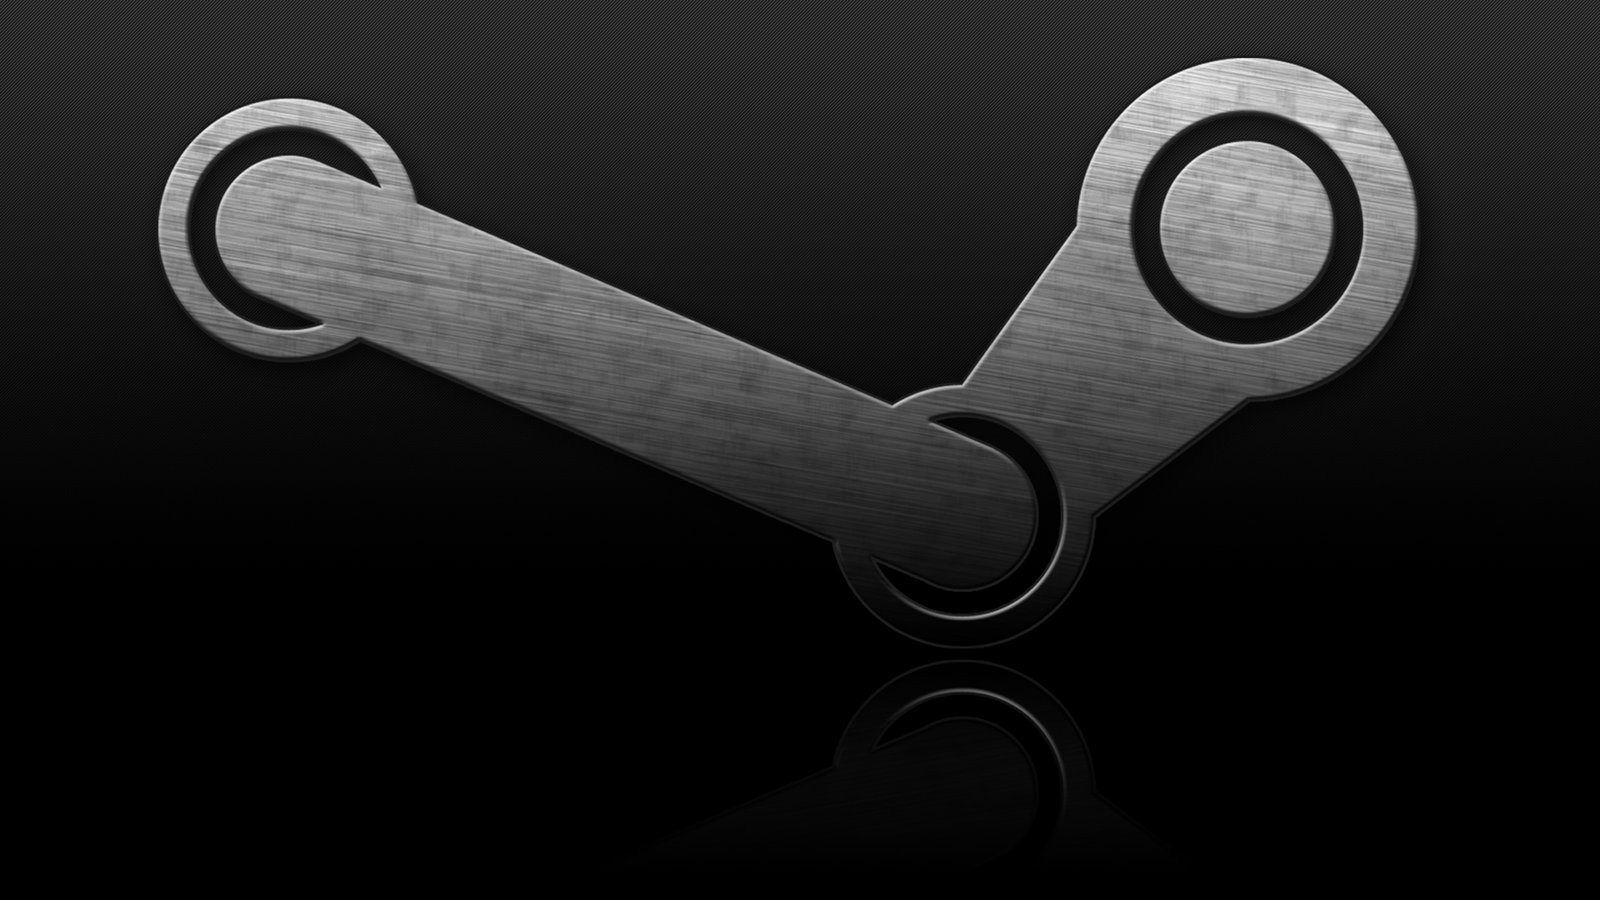 Juega gratis este fin de semana a Call of Duty: Infinite Warfare y a Naruto Shippuden: Ultimate Ninja Storm 4 en Steam